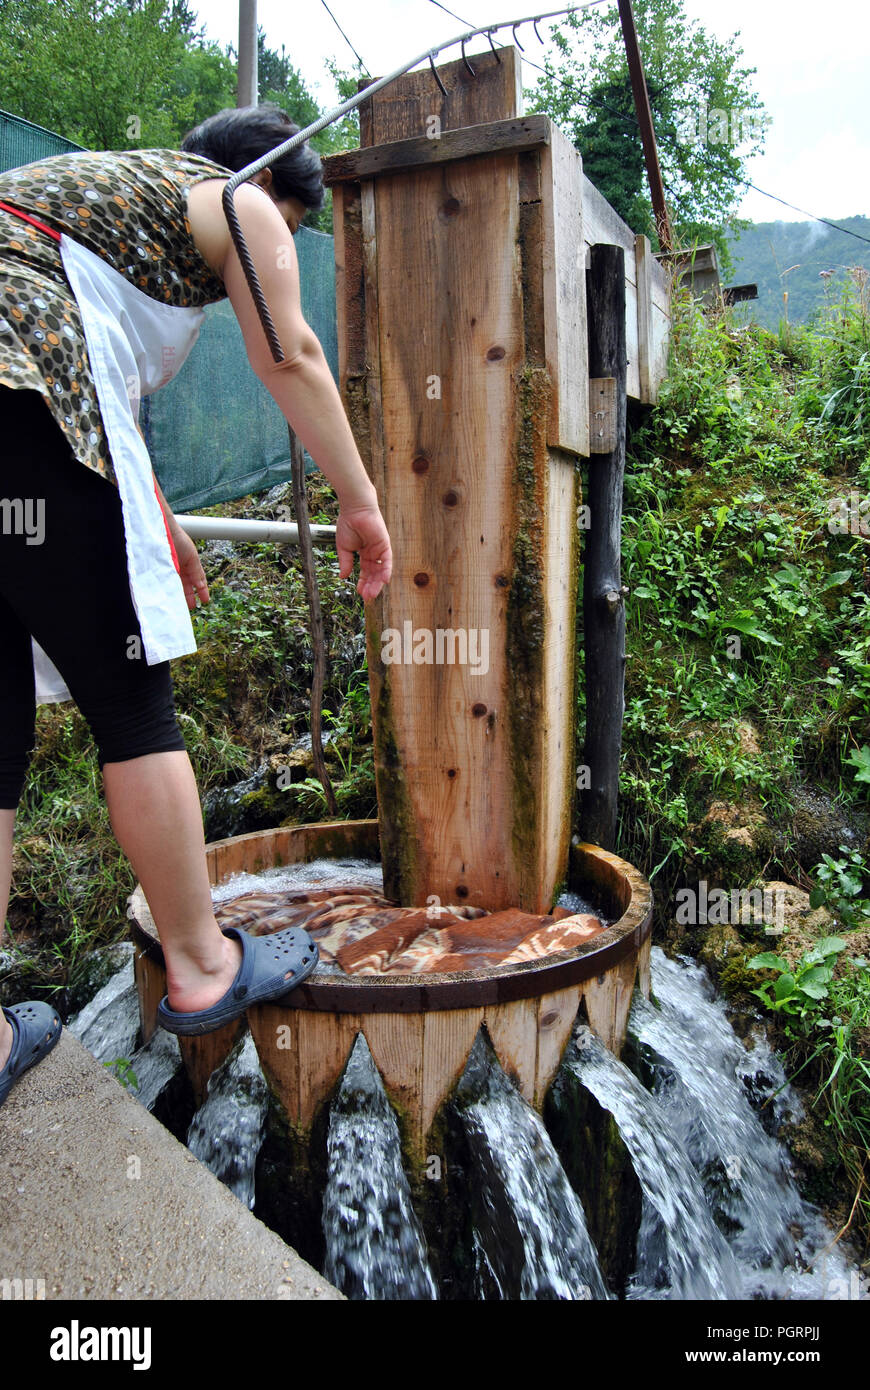 Martin Brod, Bosnia-Herzegovina. The 'Bucnica' typical eco laundry - Stock Image